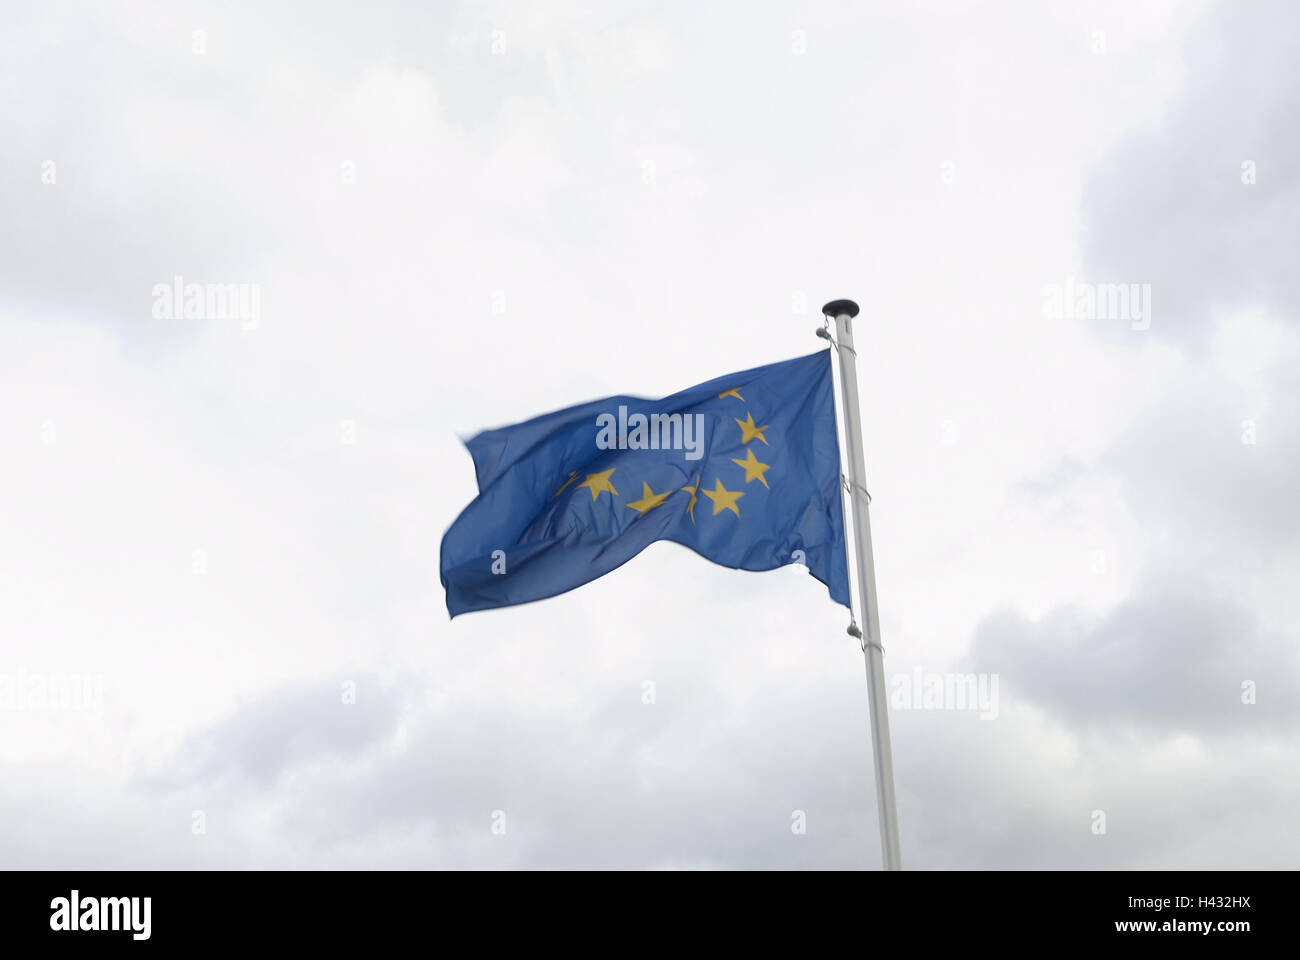 Flagpole, EU flag, flagpole, flag, flag, the EU, European flag, stars, member states, twelve, wind, blow, icon, - Stock Image